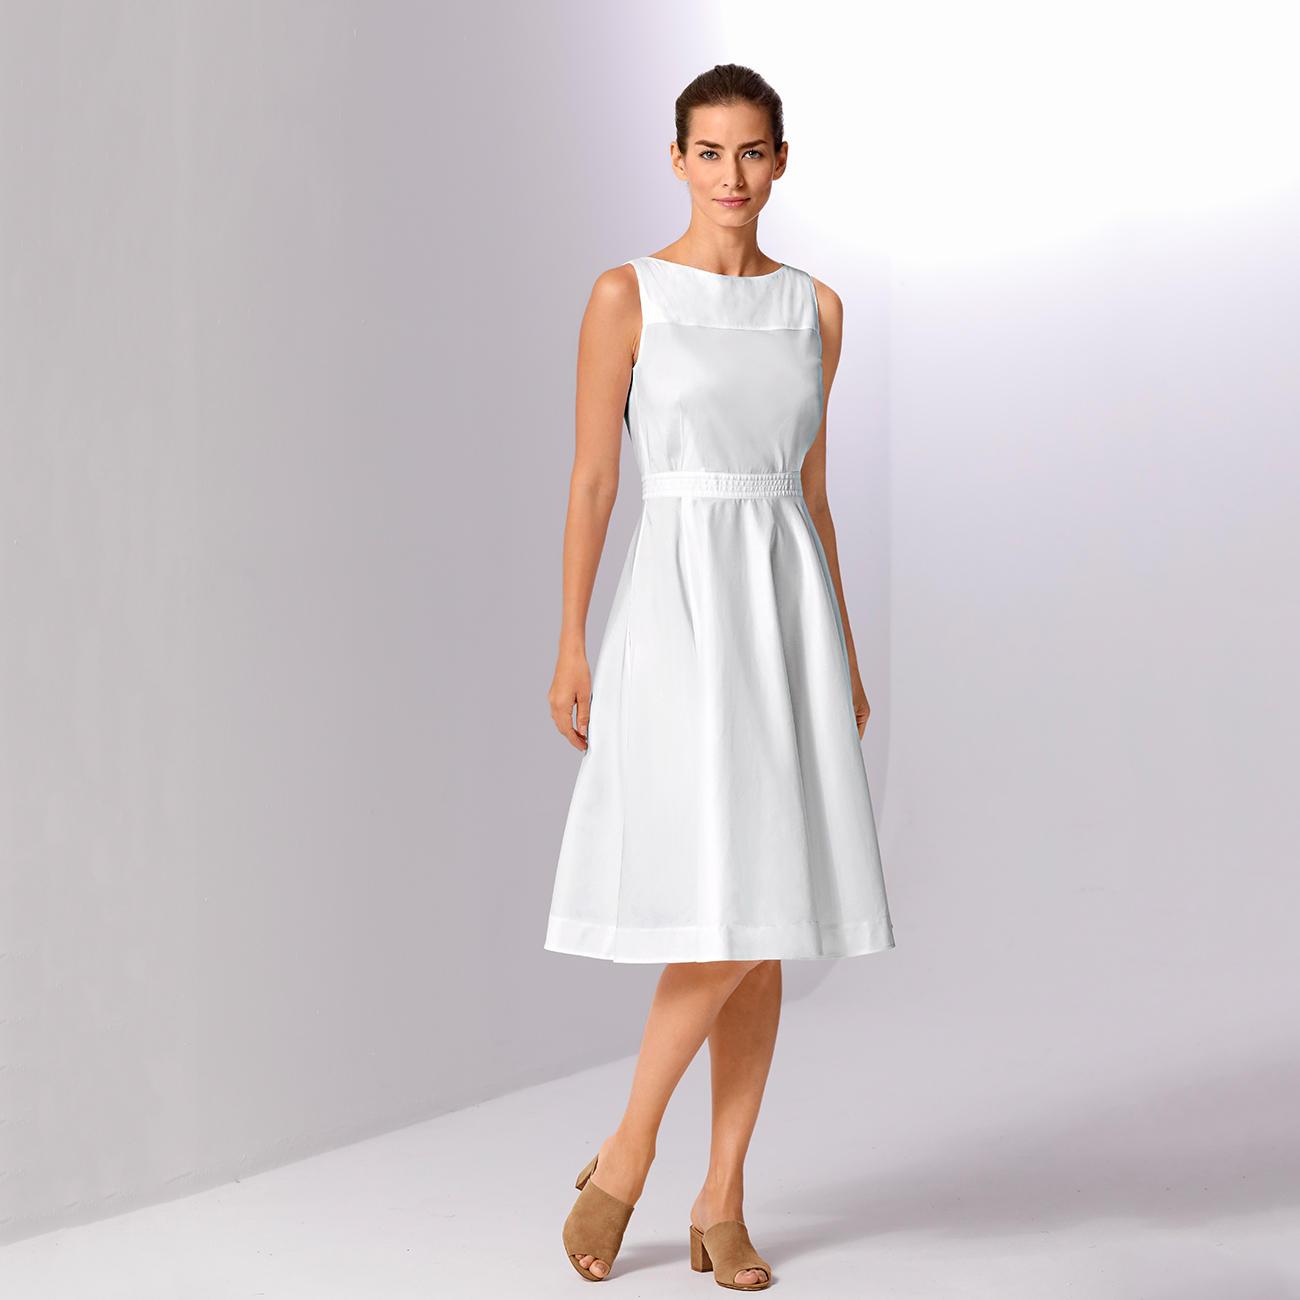 96b8fb9e083915 Paule Ka Couture-Kleid - Die feminine Eleganz der 50ies. Neu aufgelegt vom  Pariser